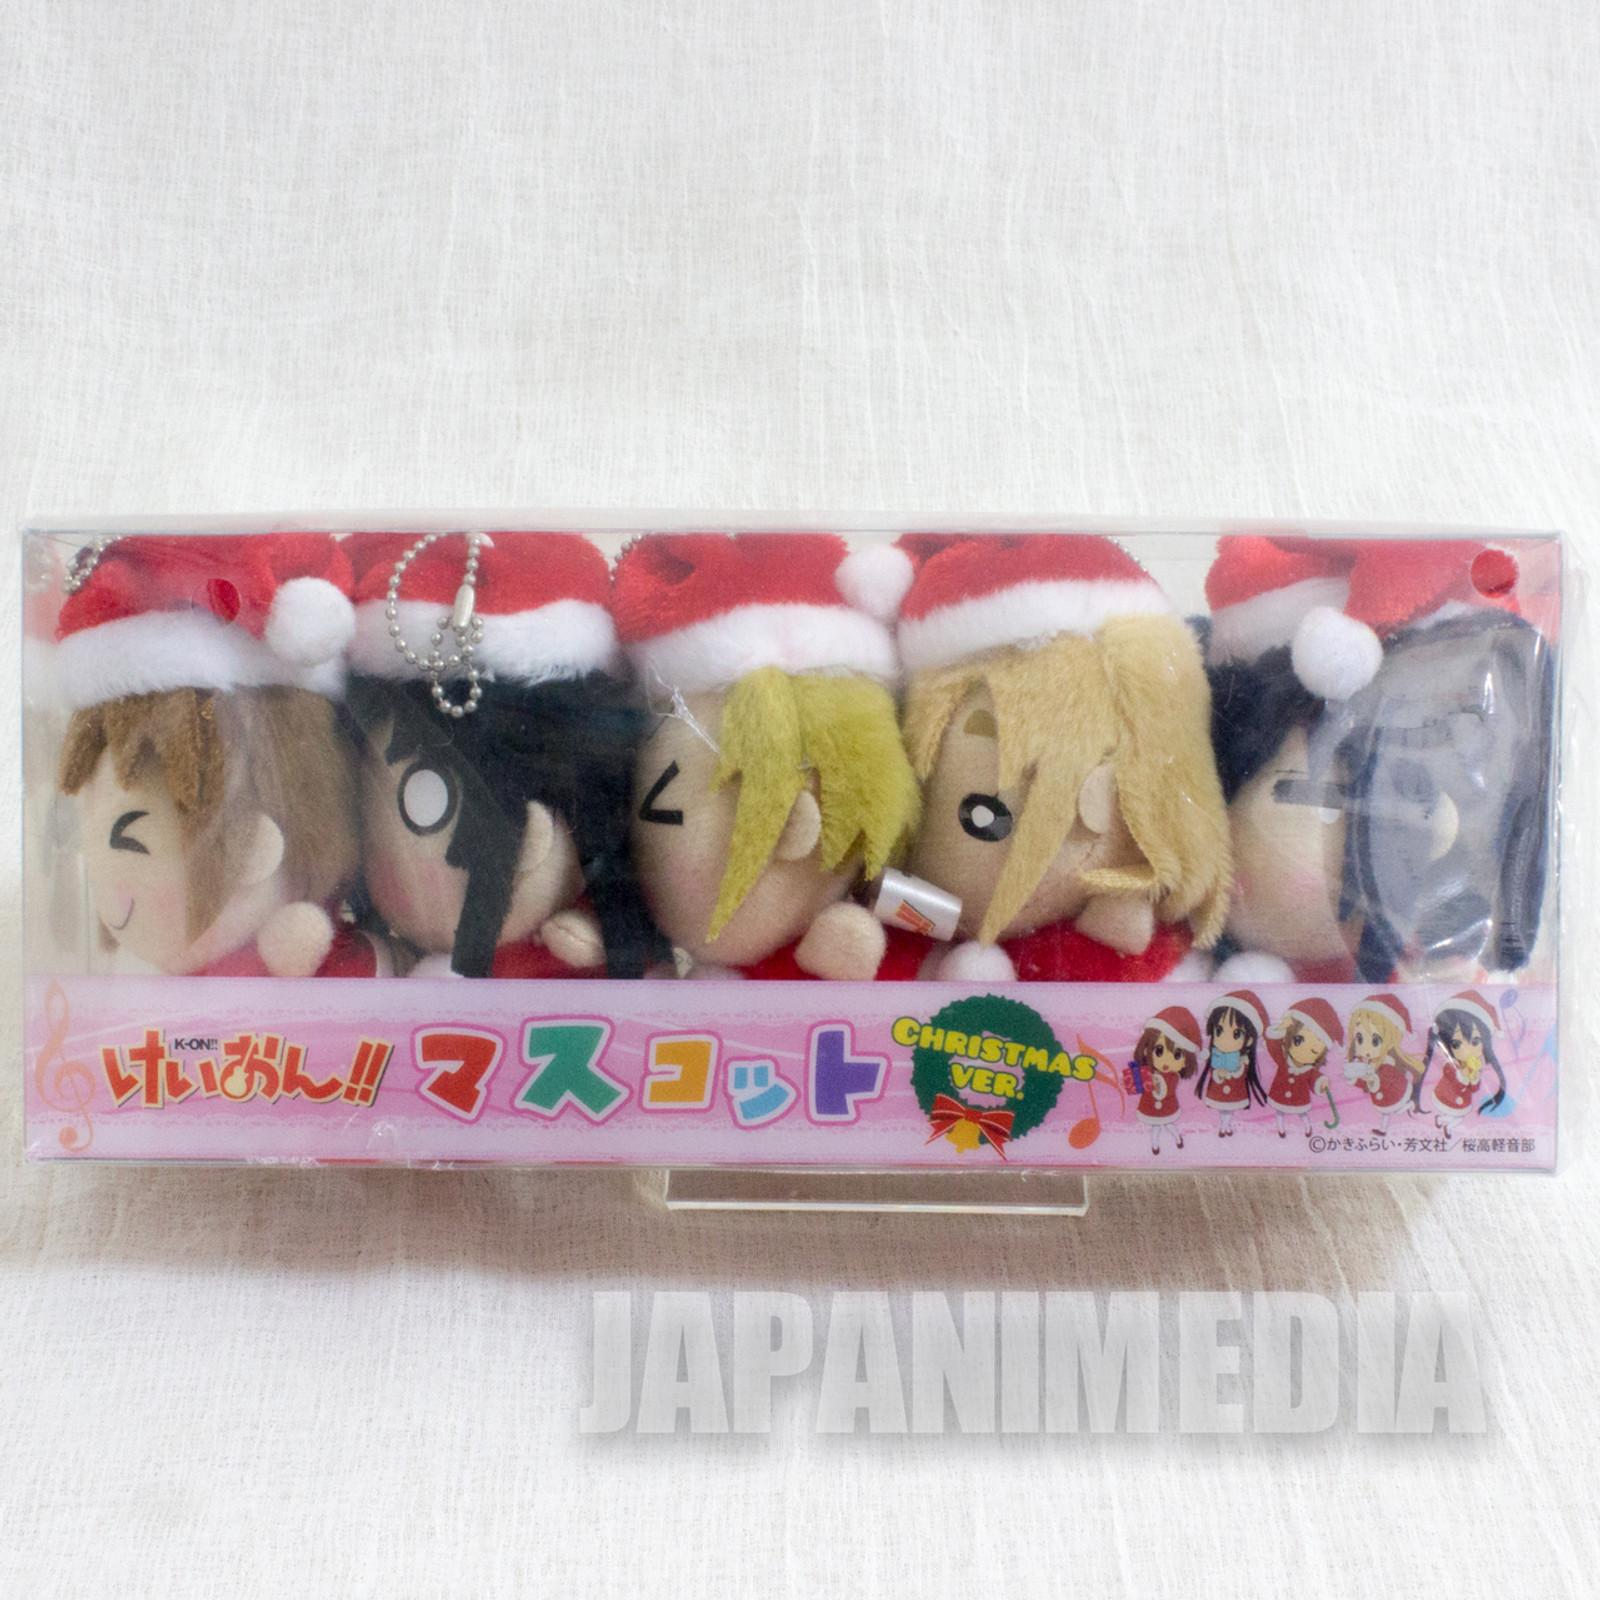 K-ON Mini Plush Doll Christmas ver. 5pc Set Yui Mio Ritus Tsumugi Azusa JAPAN